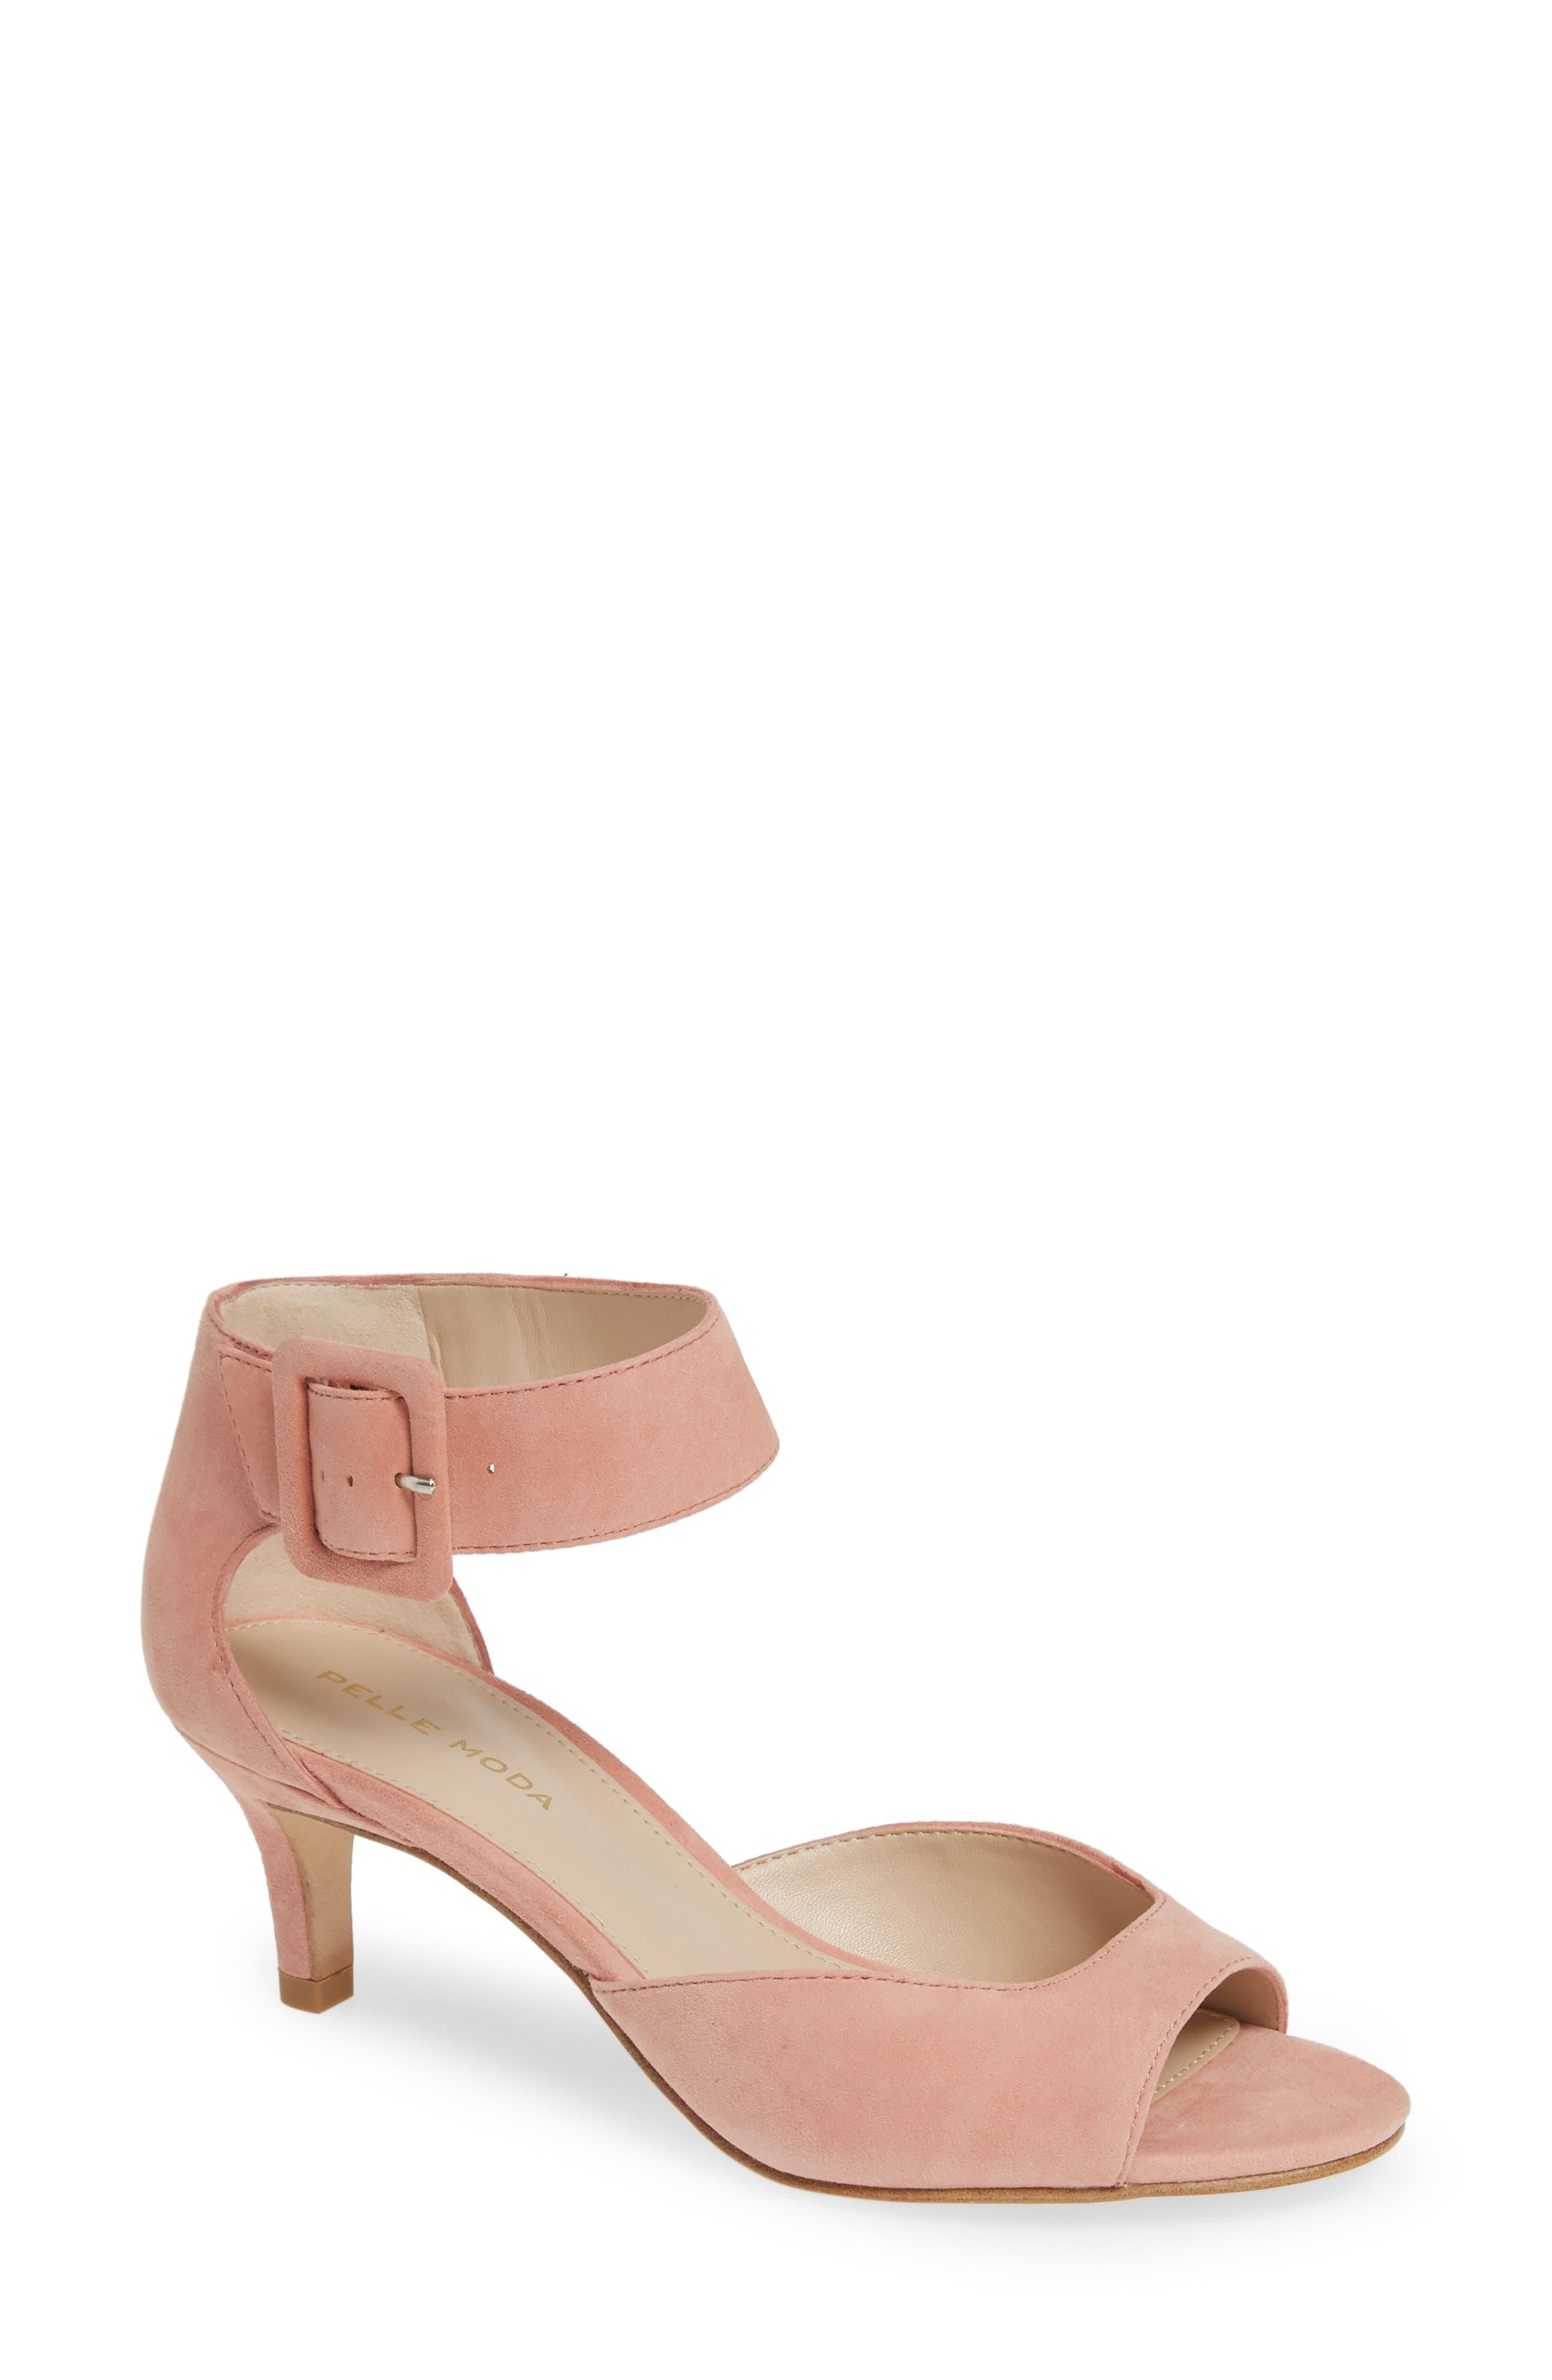 8e6142c95a90 Pelle Moda Sandals - Women s